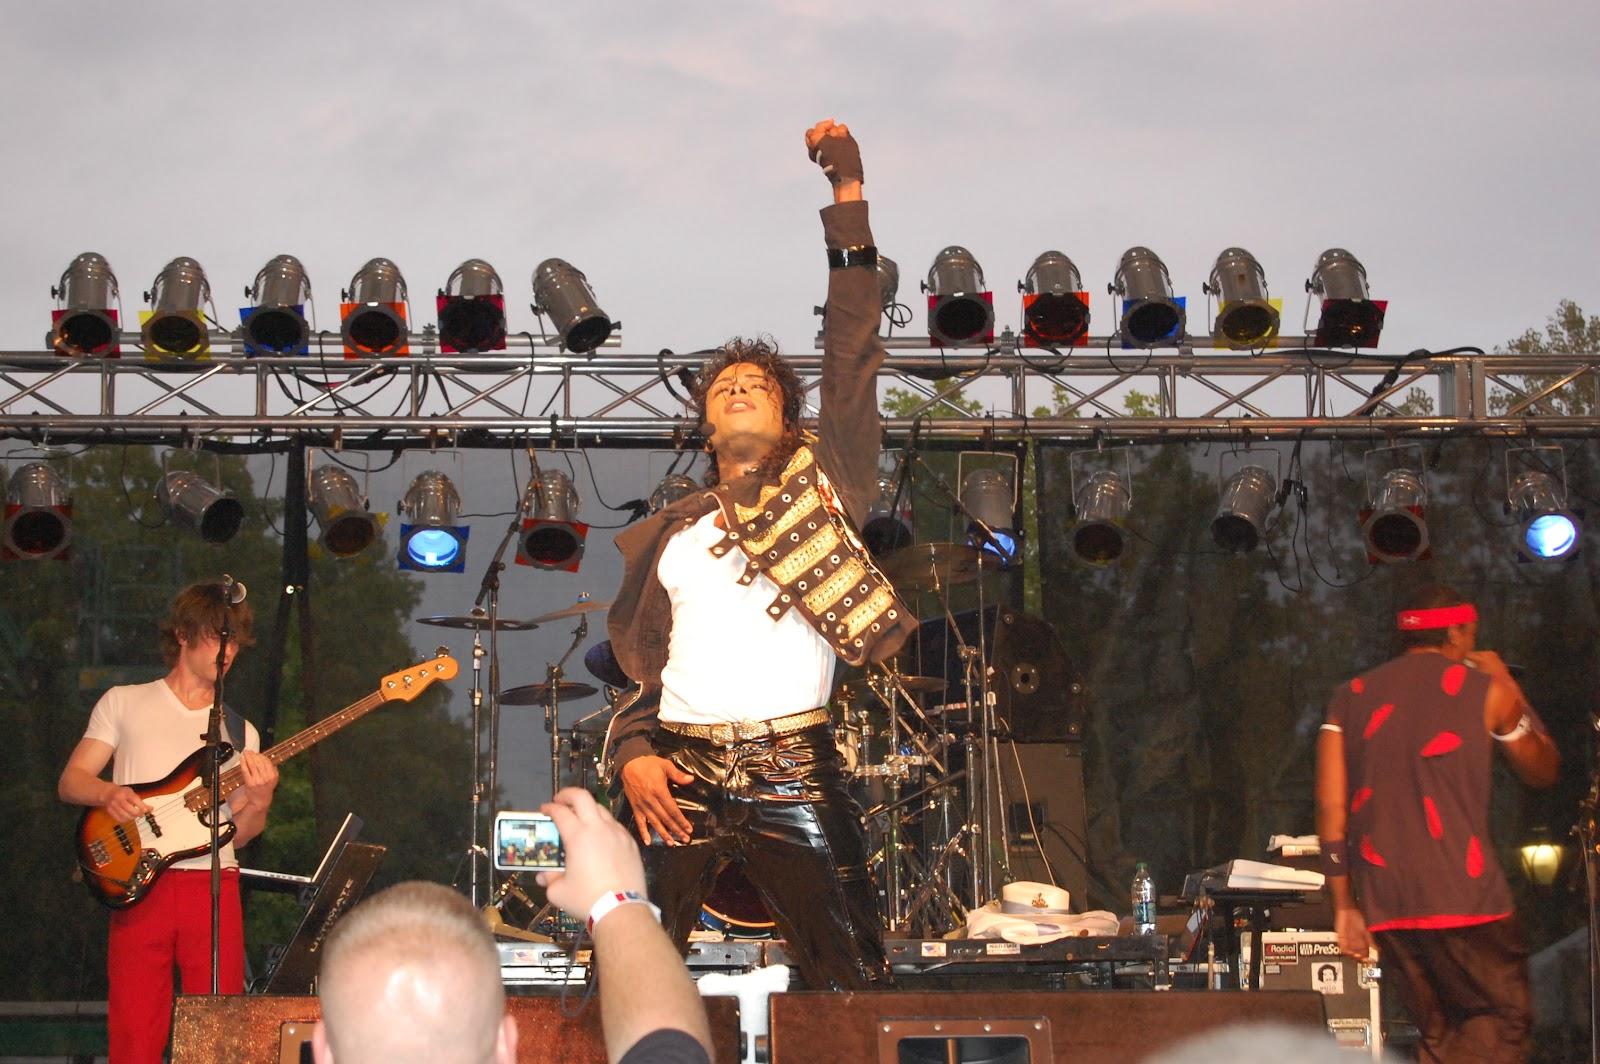 http://3.bp.blogspot.com/-EKVmO6P9xSc/UDthsRU3n1I/AAAAAAAAAv4/u1hGlnHXhW0/s1600/2012-07-18+Who%27s+Bad+Michael+Jackson+Tribute-Fort+Wayne,+IN.JPG